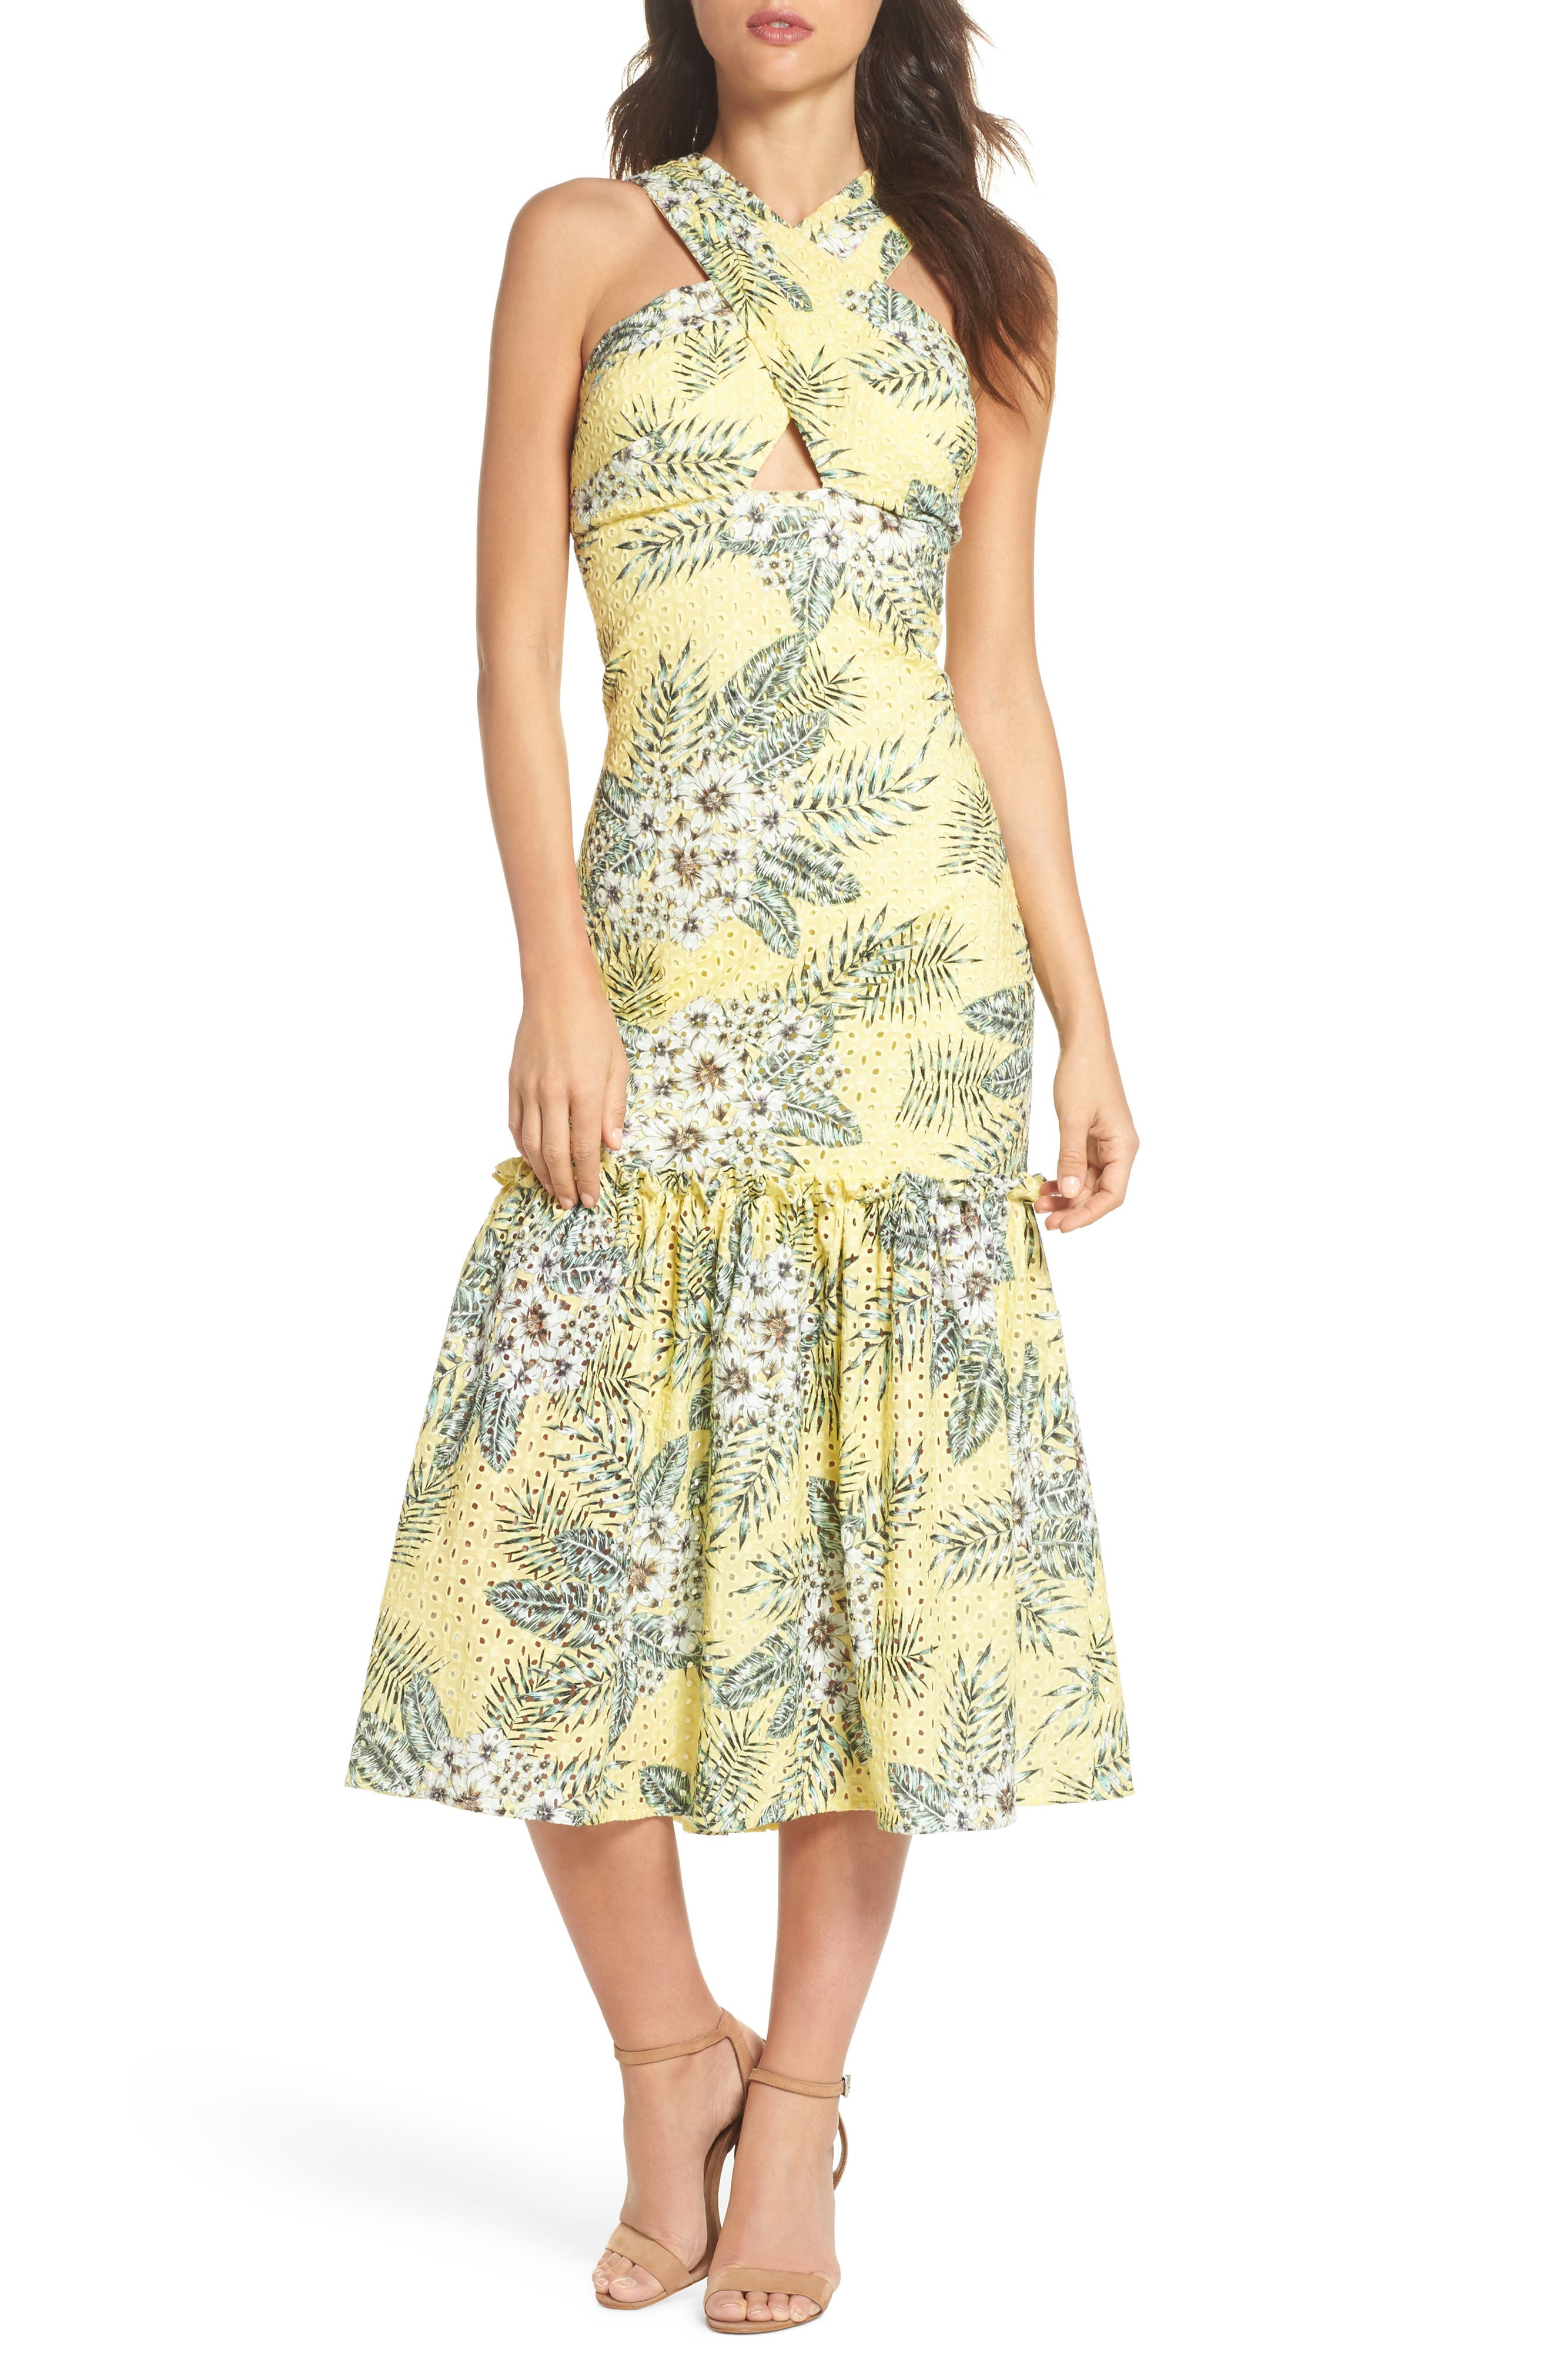 Alternate Image 1 Selected - BB Dakota Sarafina Printed Eyelet Halter Dress